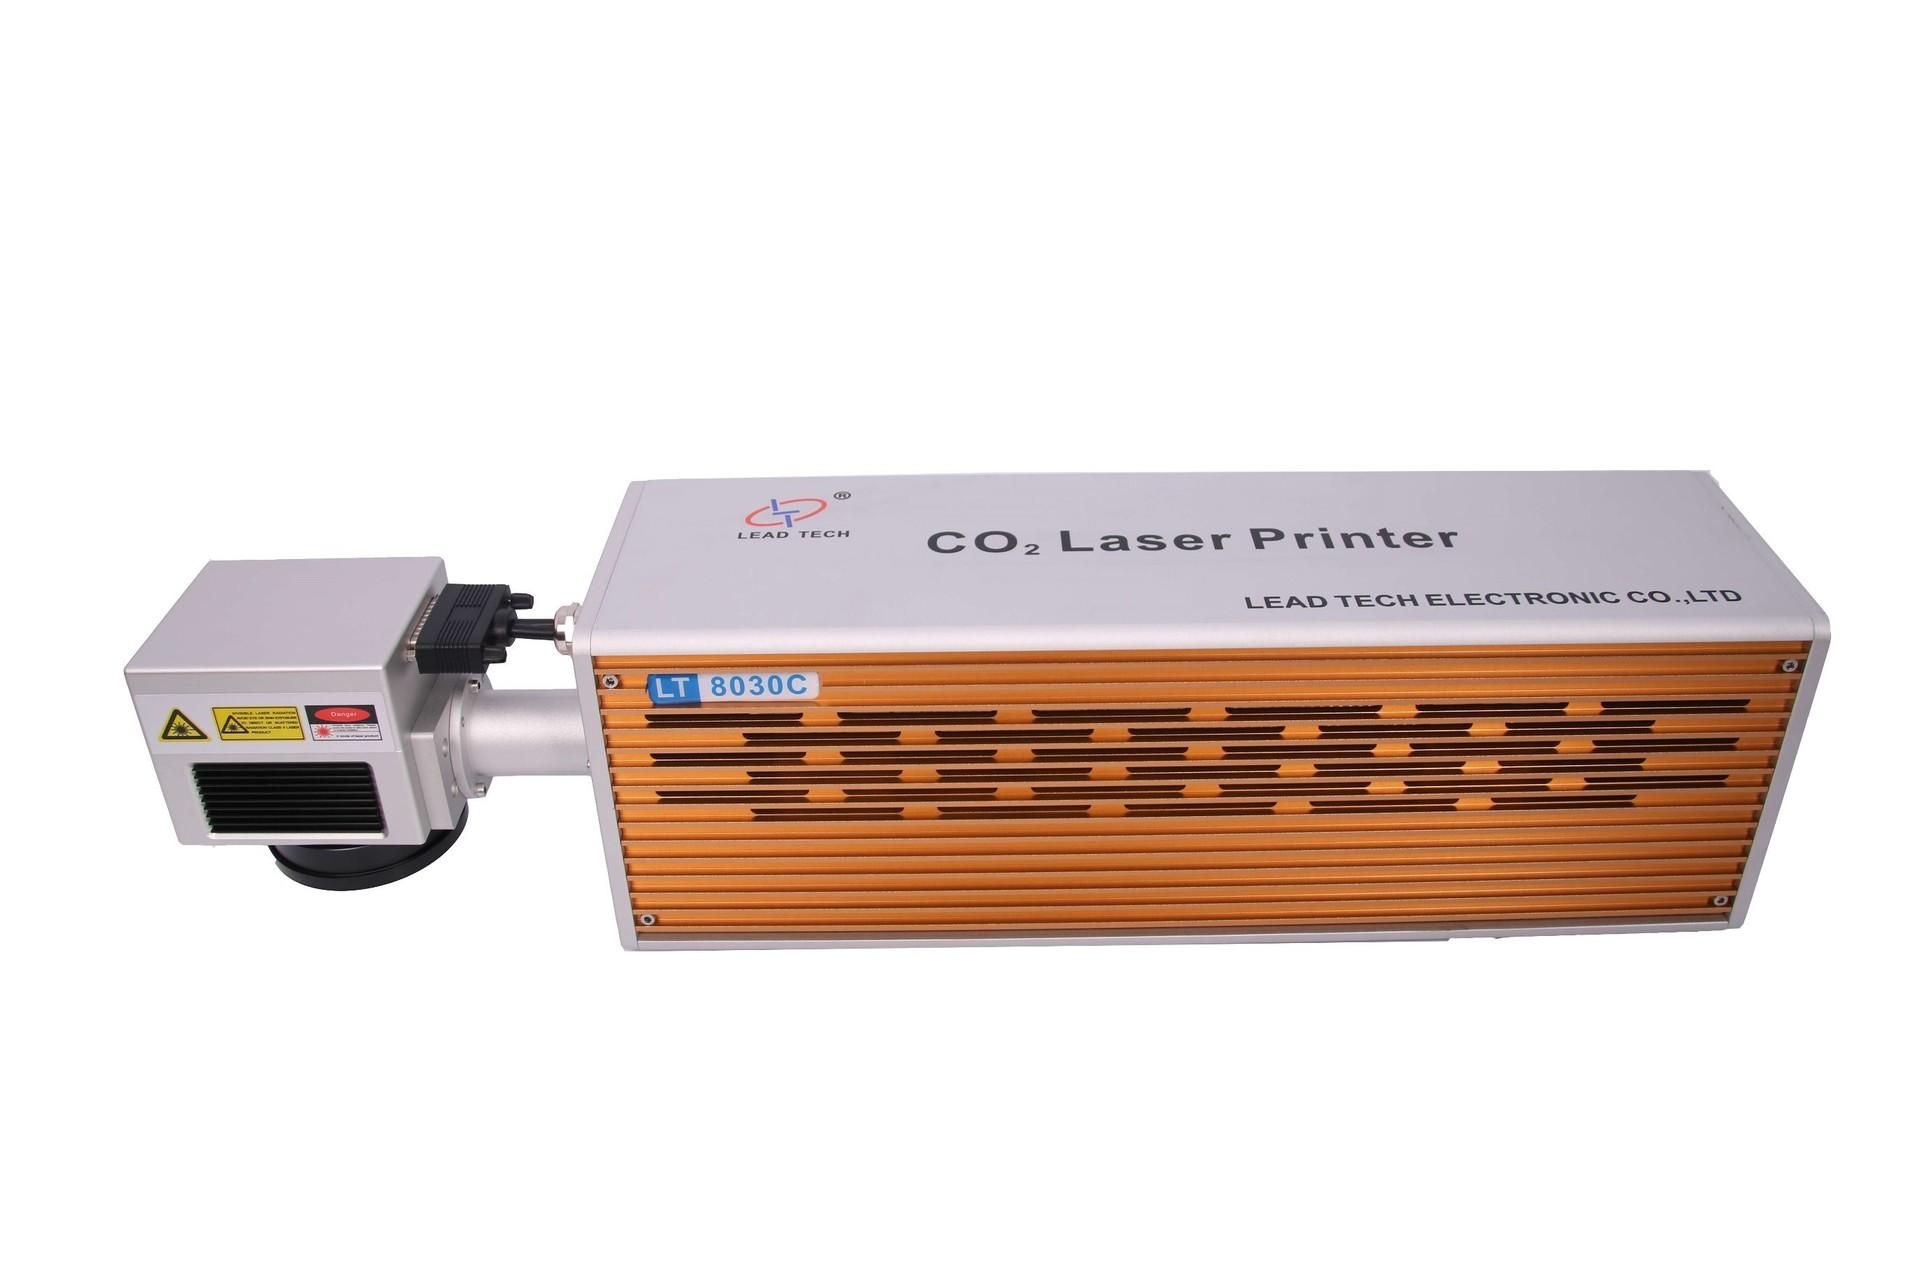 Lead Tech Lt8020c/Lt8030c CO2 20W/30W High Precision Digital Laser Engraving Marking Printer for Cables/PVC Sheets